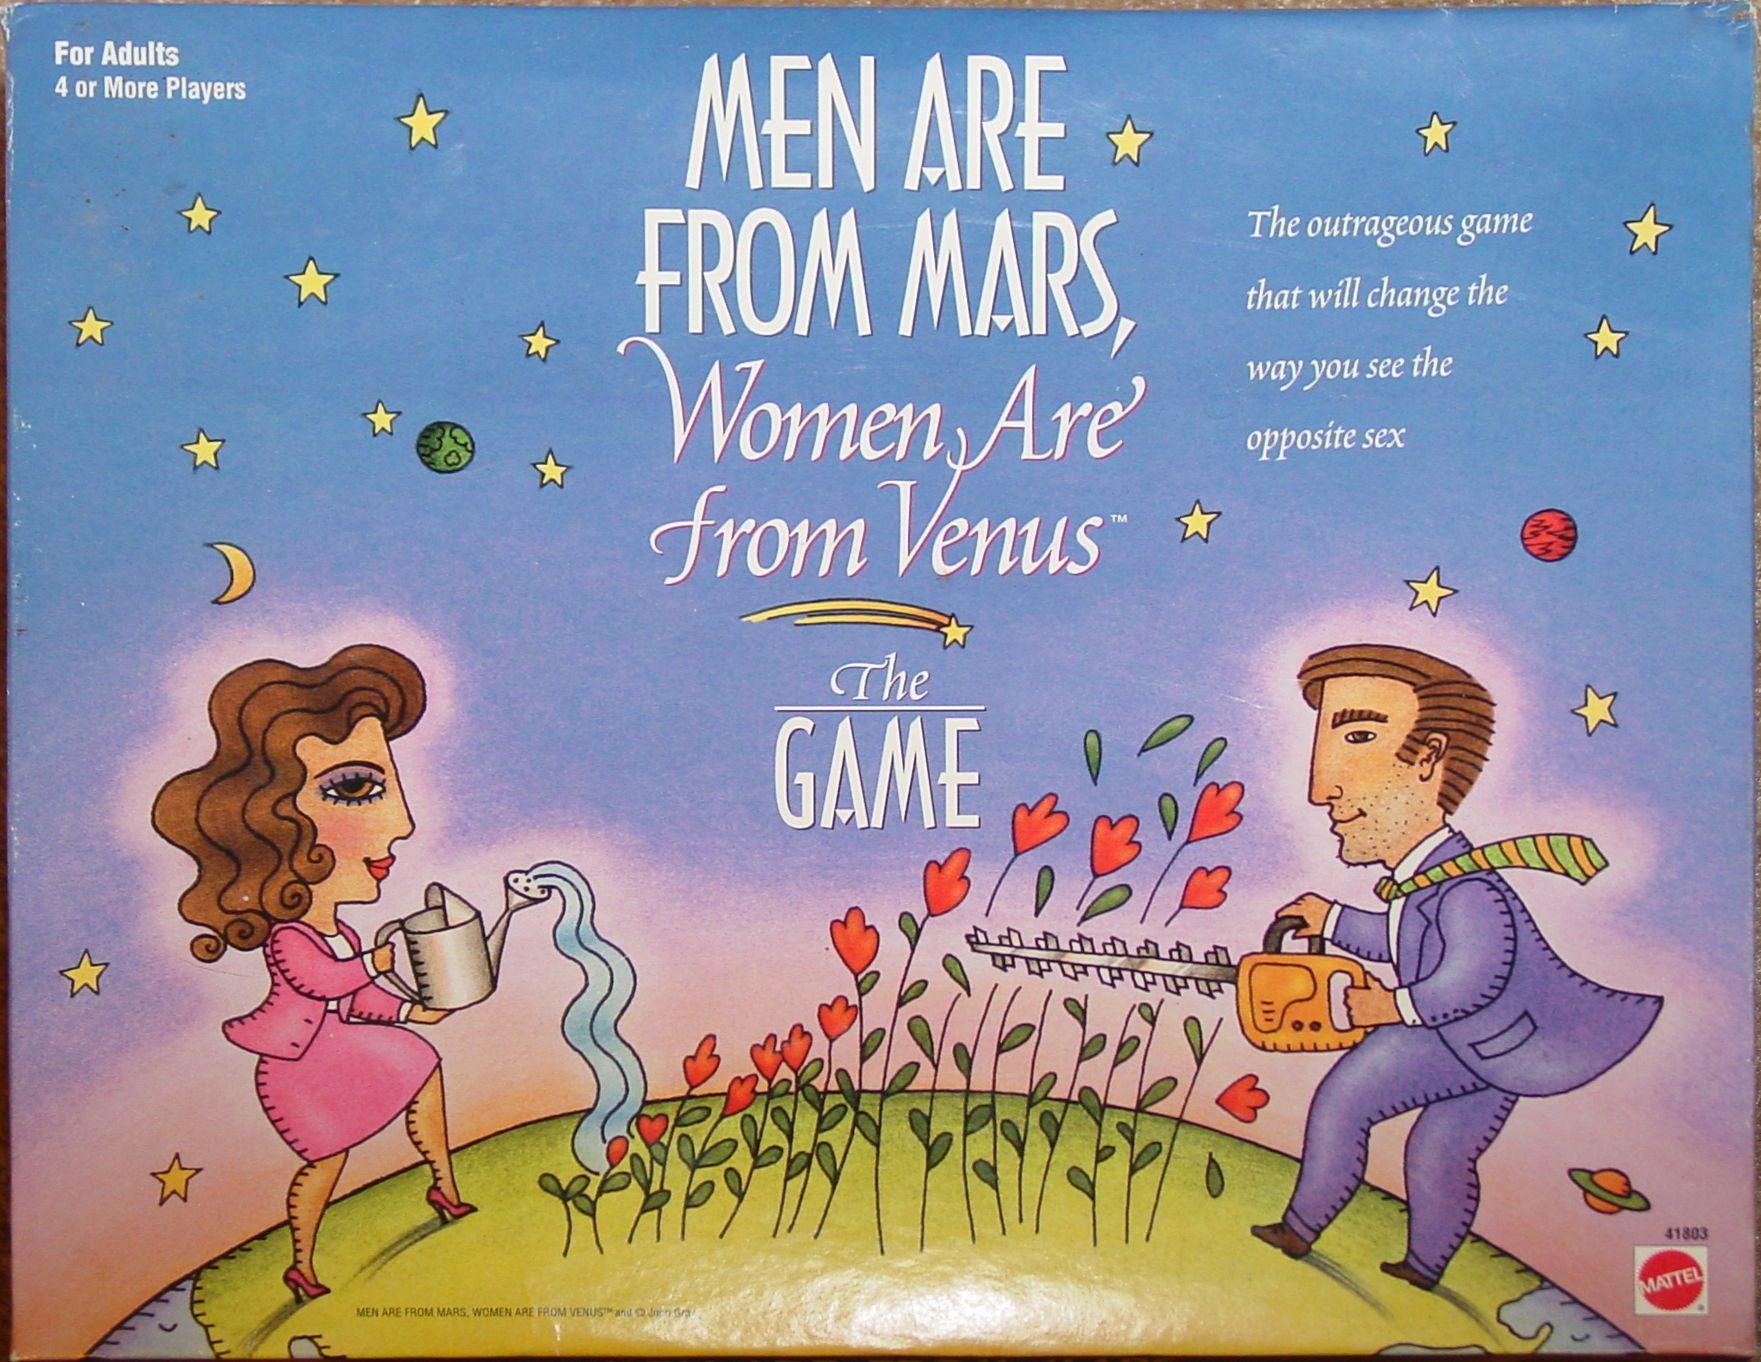 настольная игра Men Are from Mars, Women Are from Venus Мужчины с Марса, женщины с Венеры